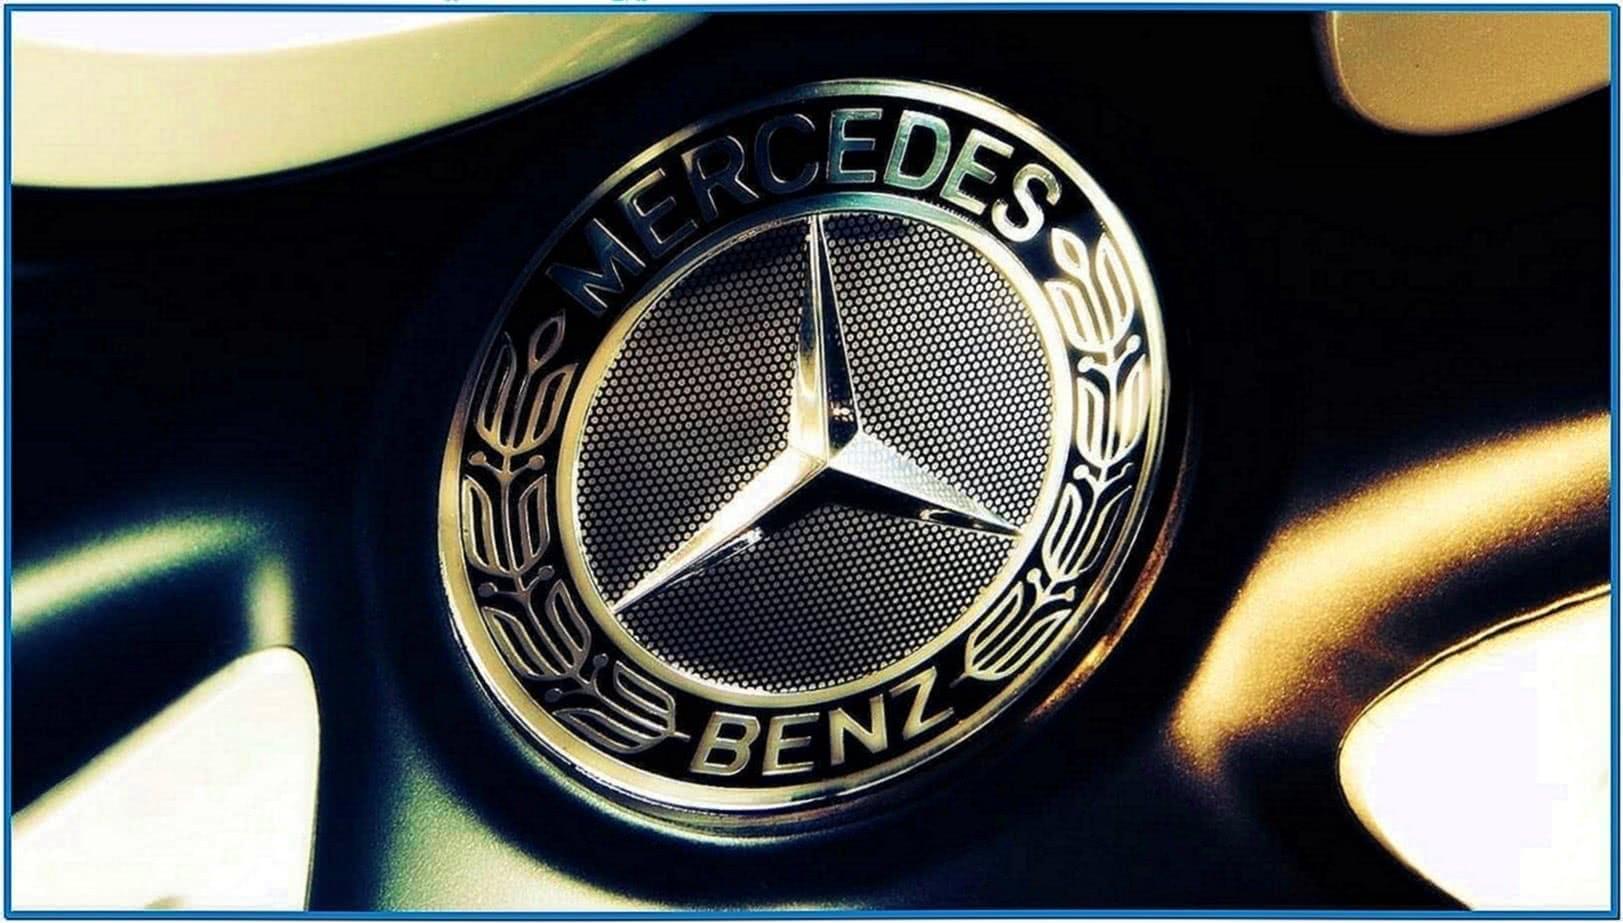 Mercedes benz logo screensaver - Download free